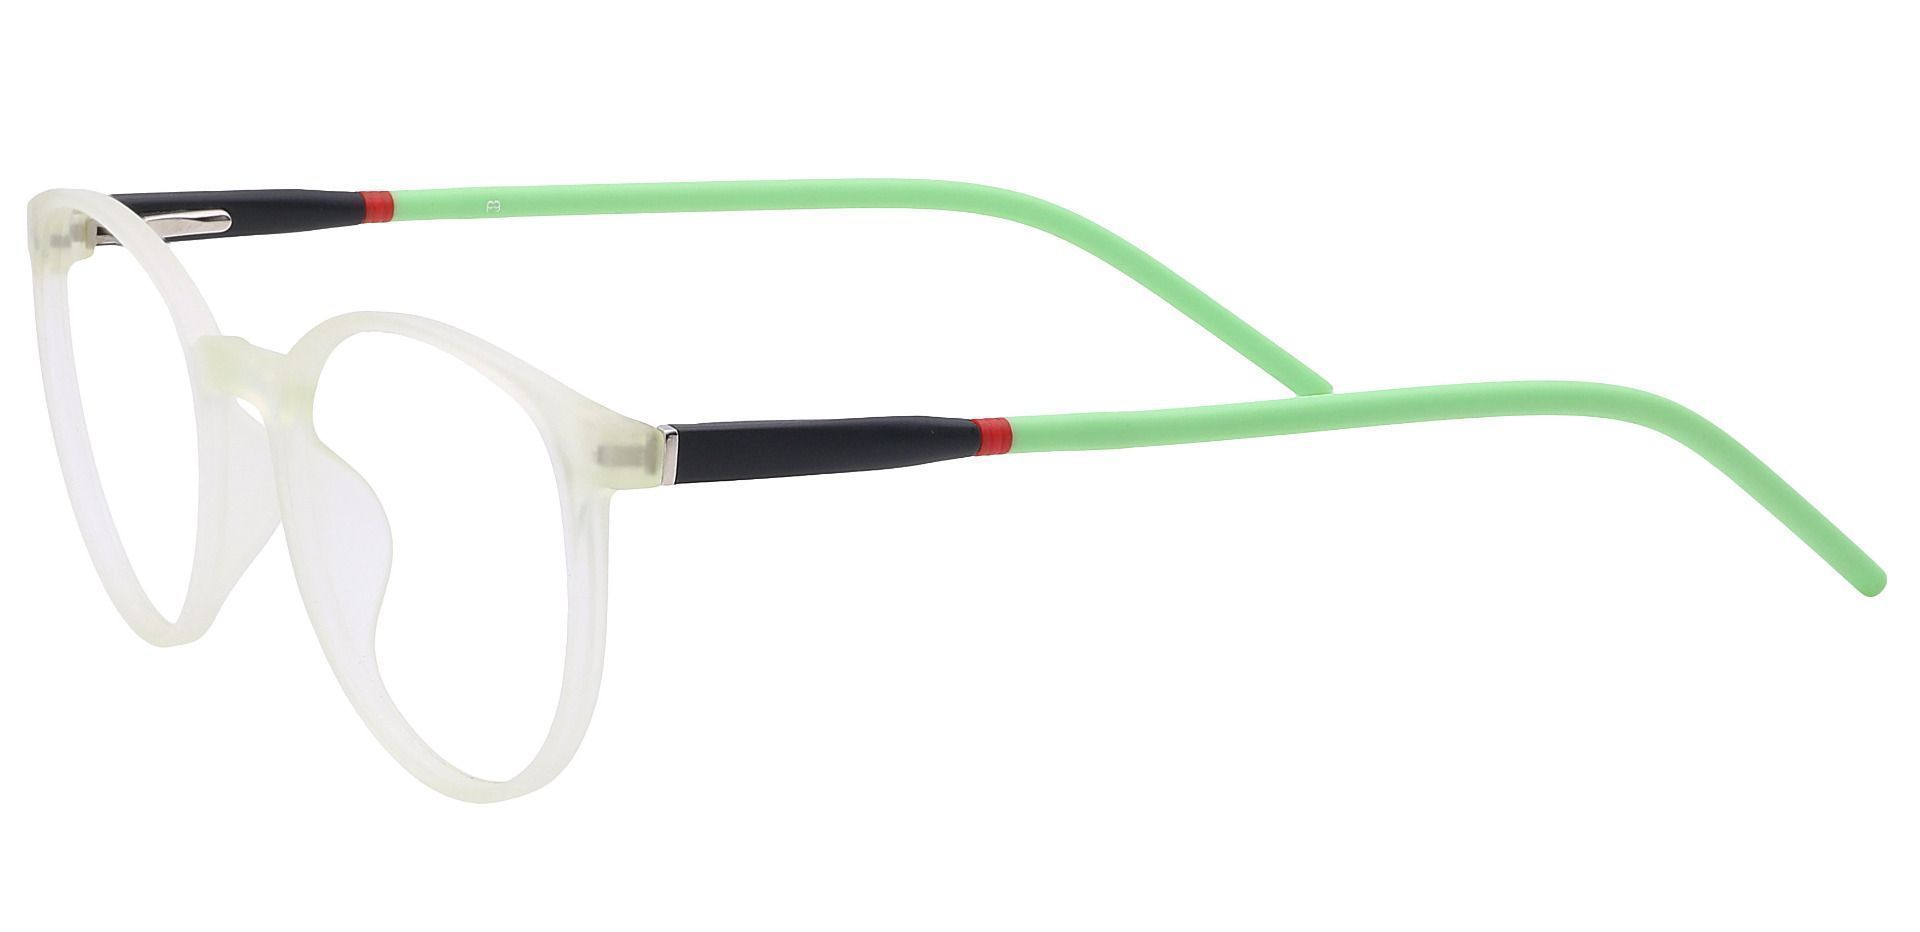 Vivi Round Prescription Glasses - Green